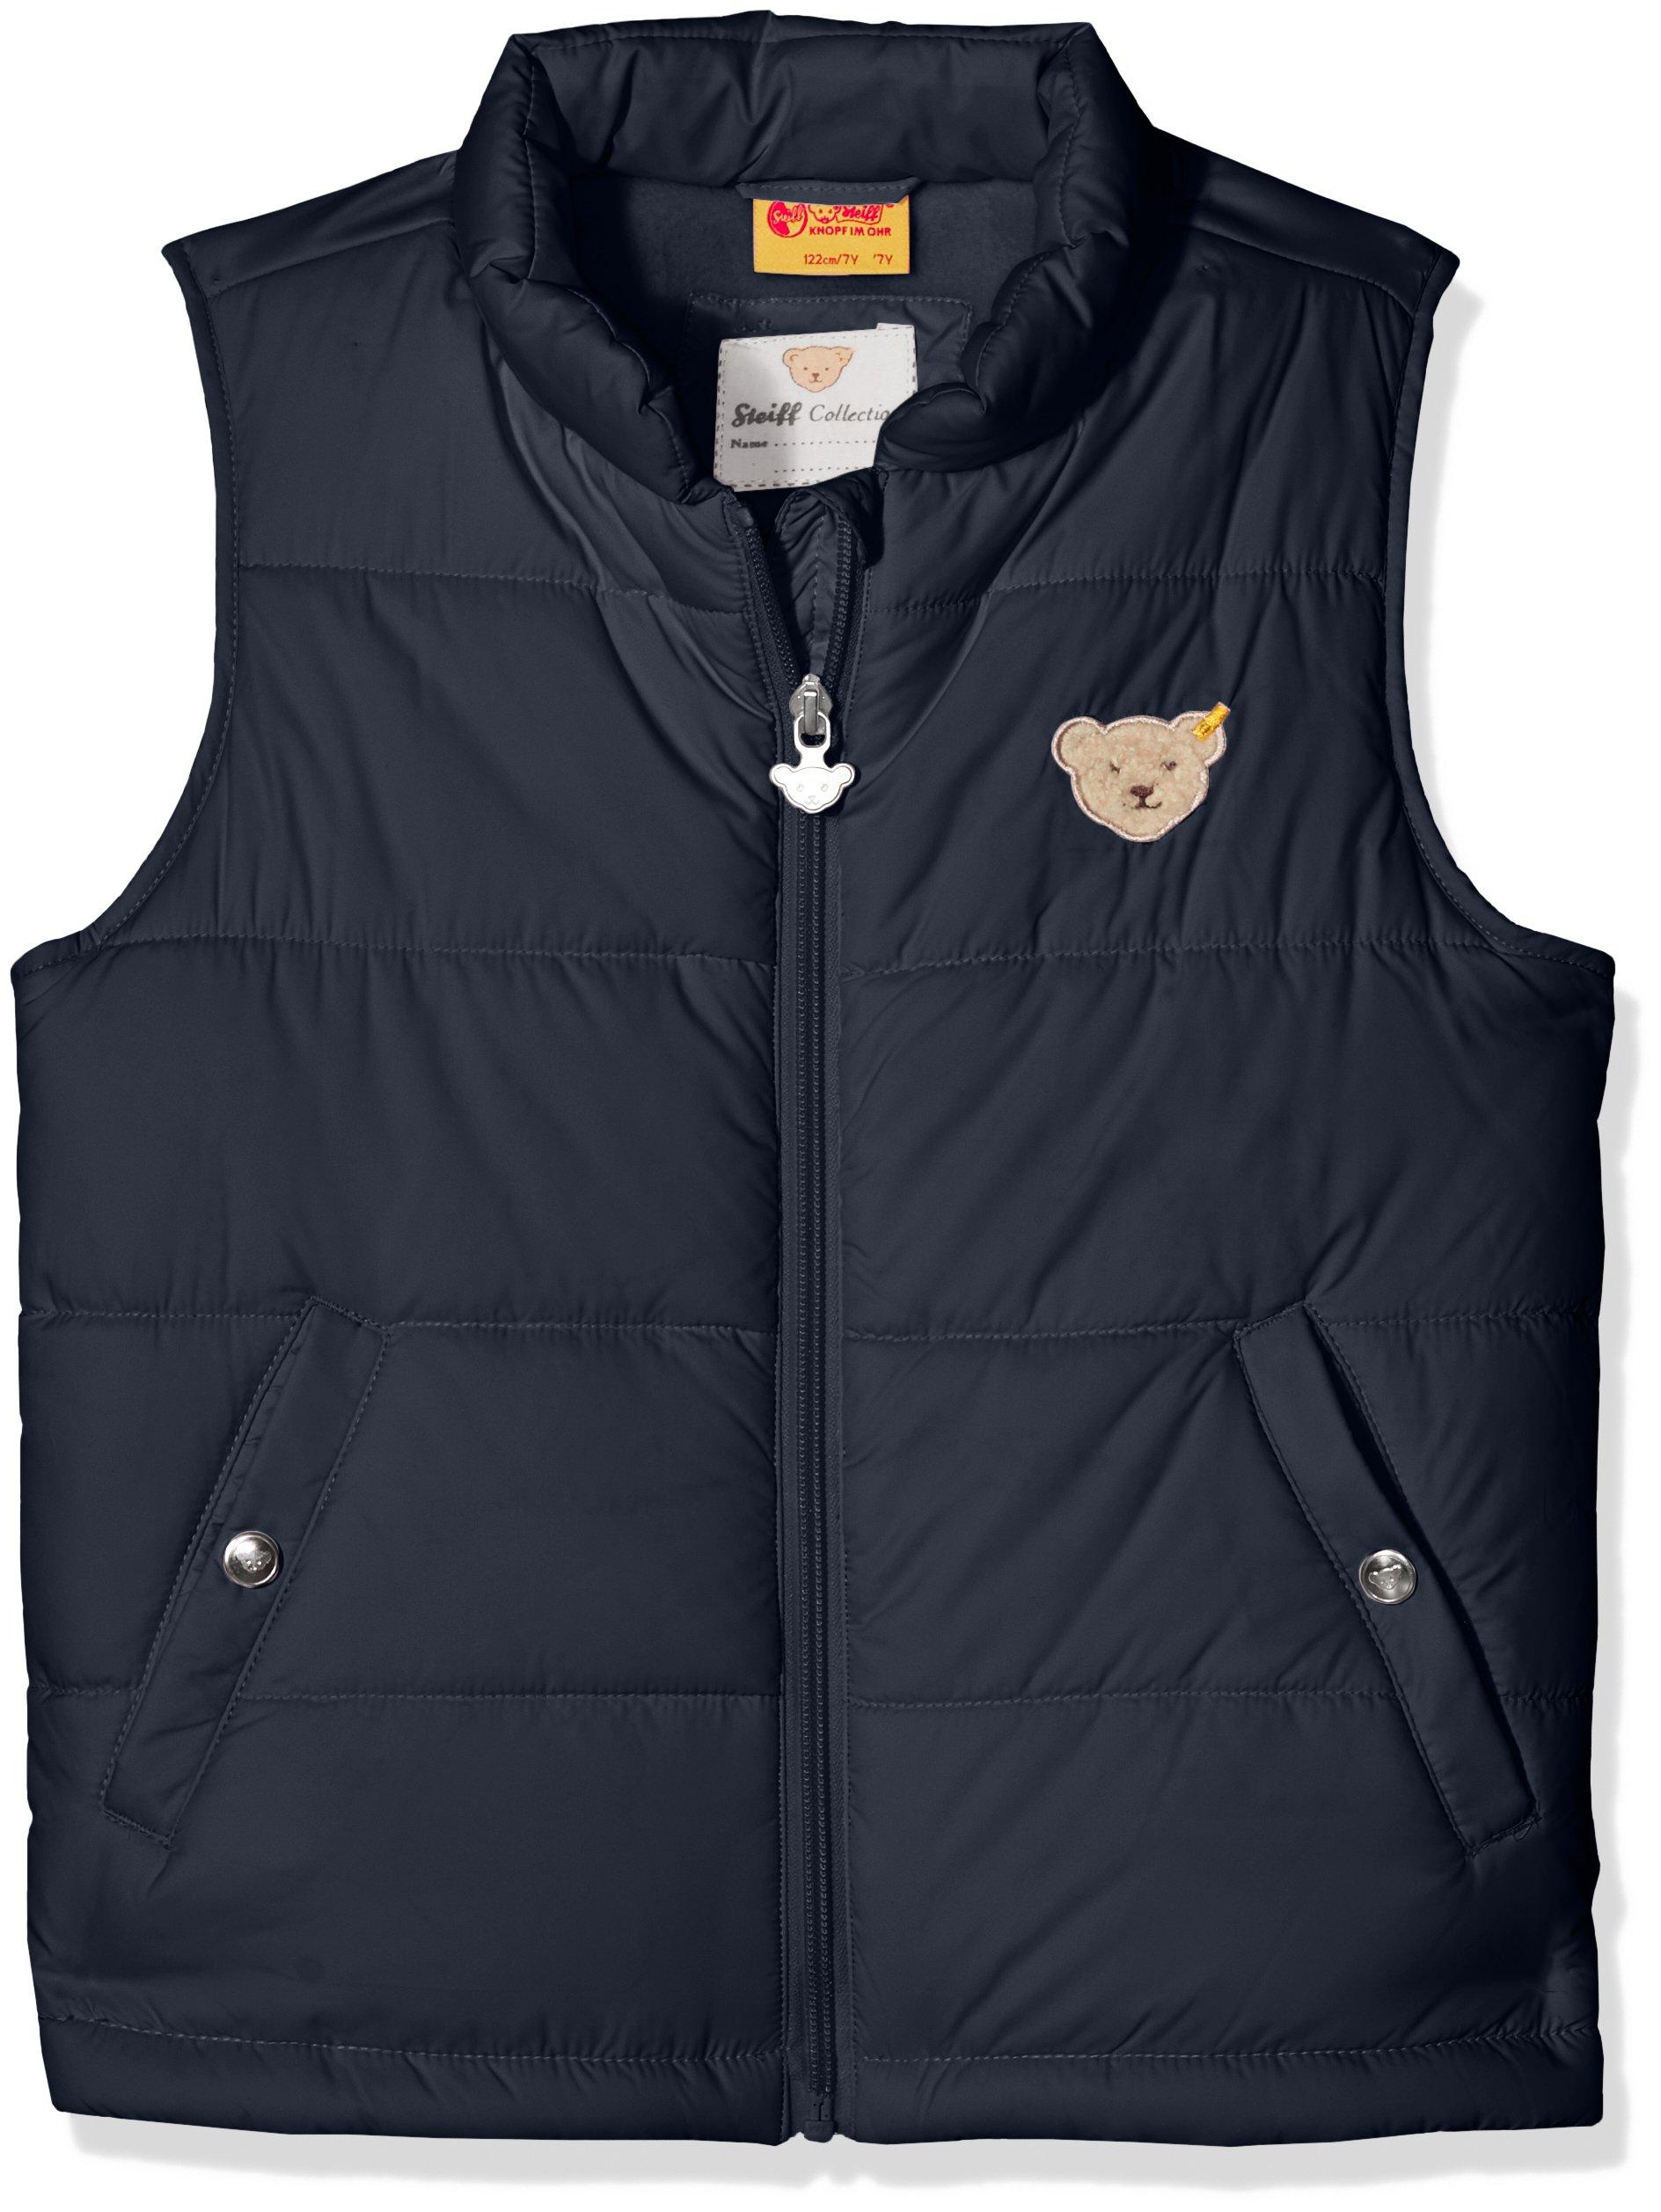 Steiff Unisex Vest Without Sleeves, Blue (122)